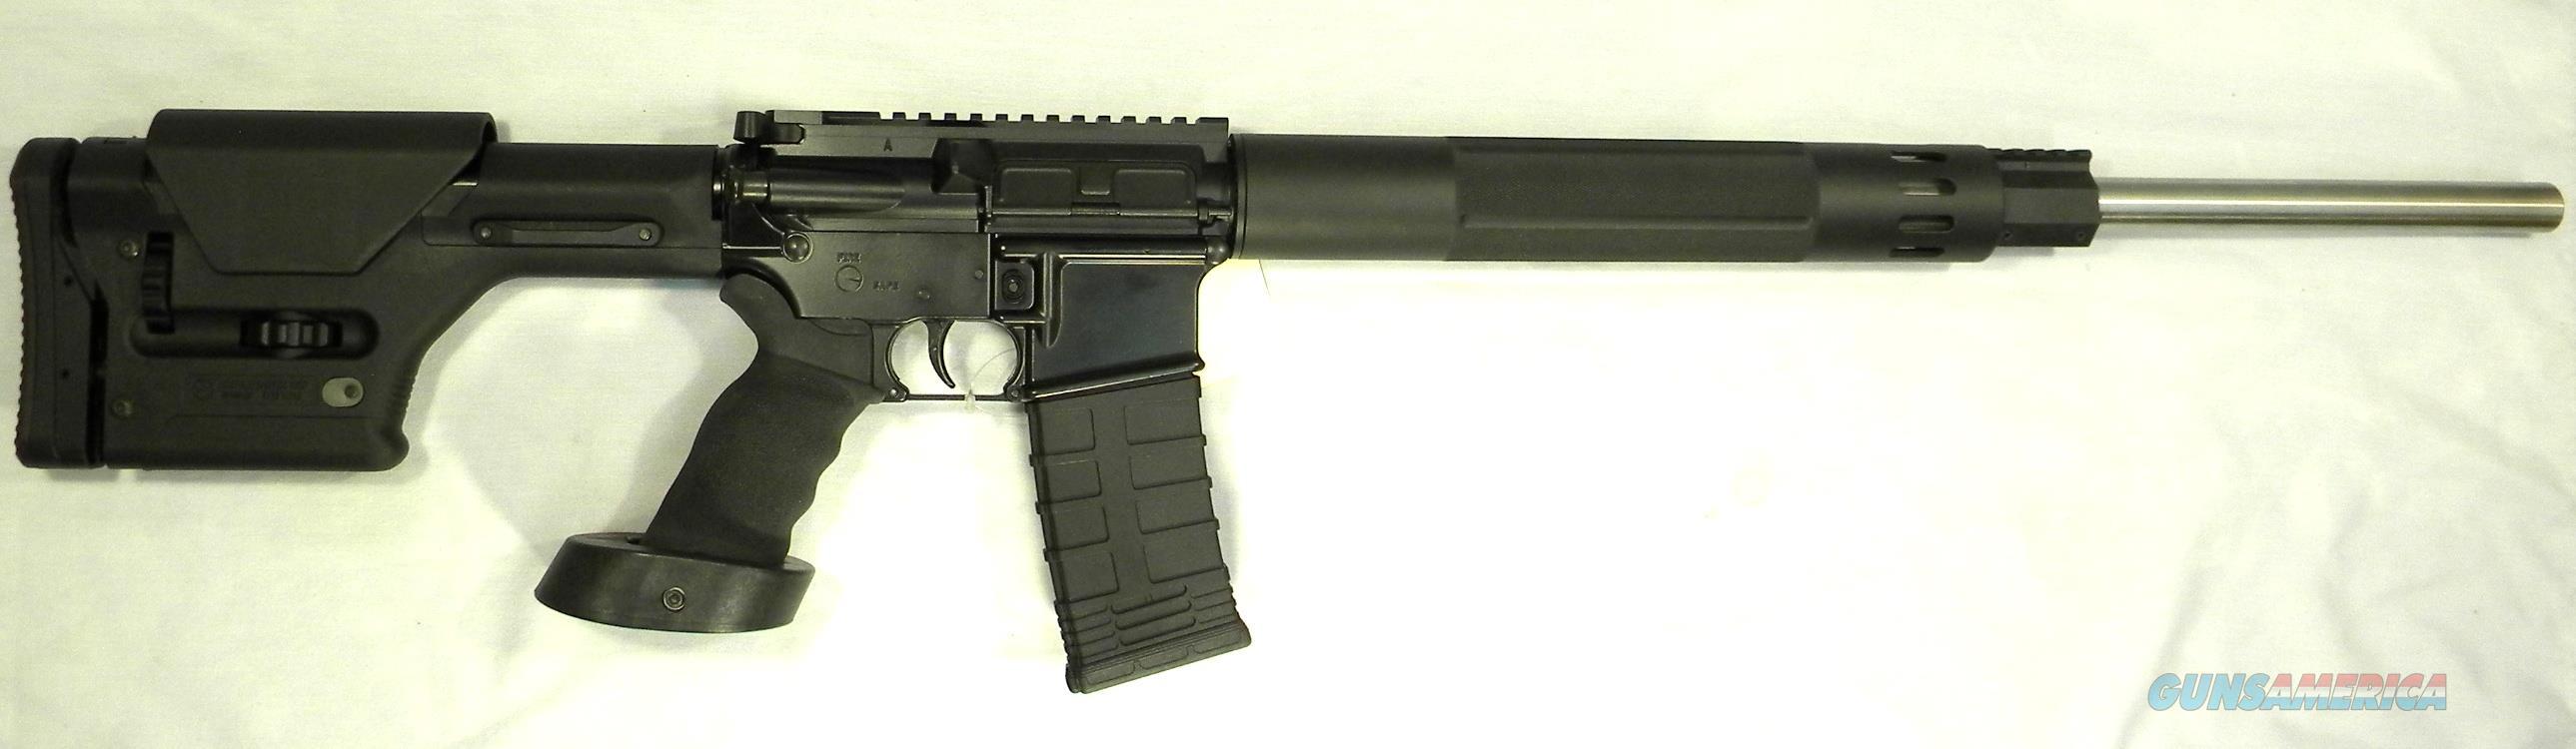 "Double Star Corp/DSC STAR-15 ""Super Match Enhanced"", .5.56 NATO Semi-Auto Rifle  Guns > Rifles > D Misc Rifles"